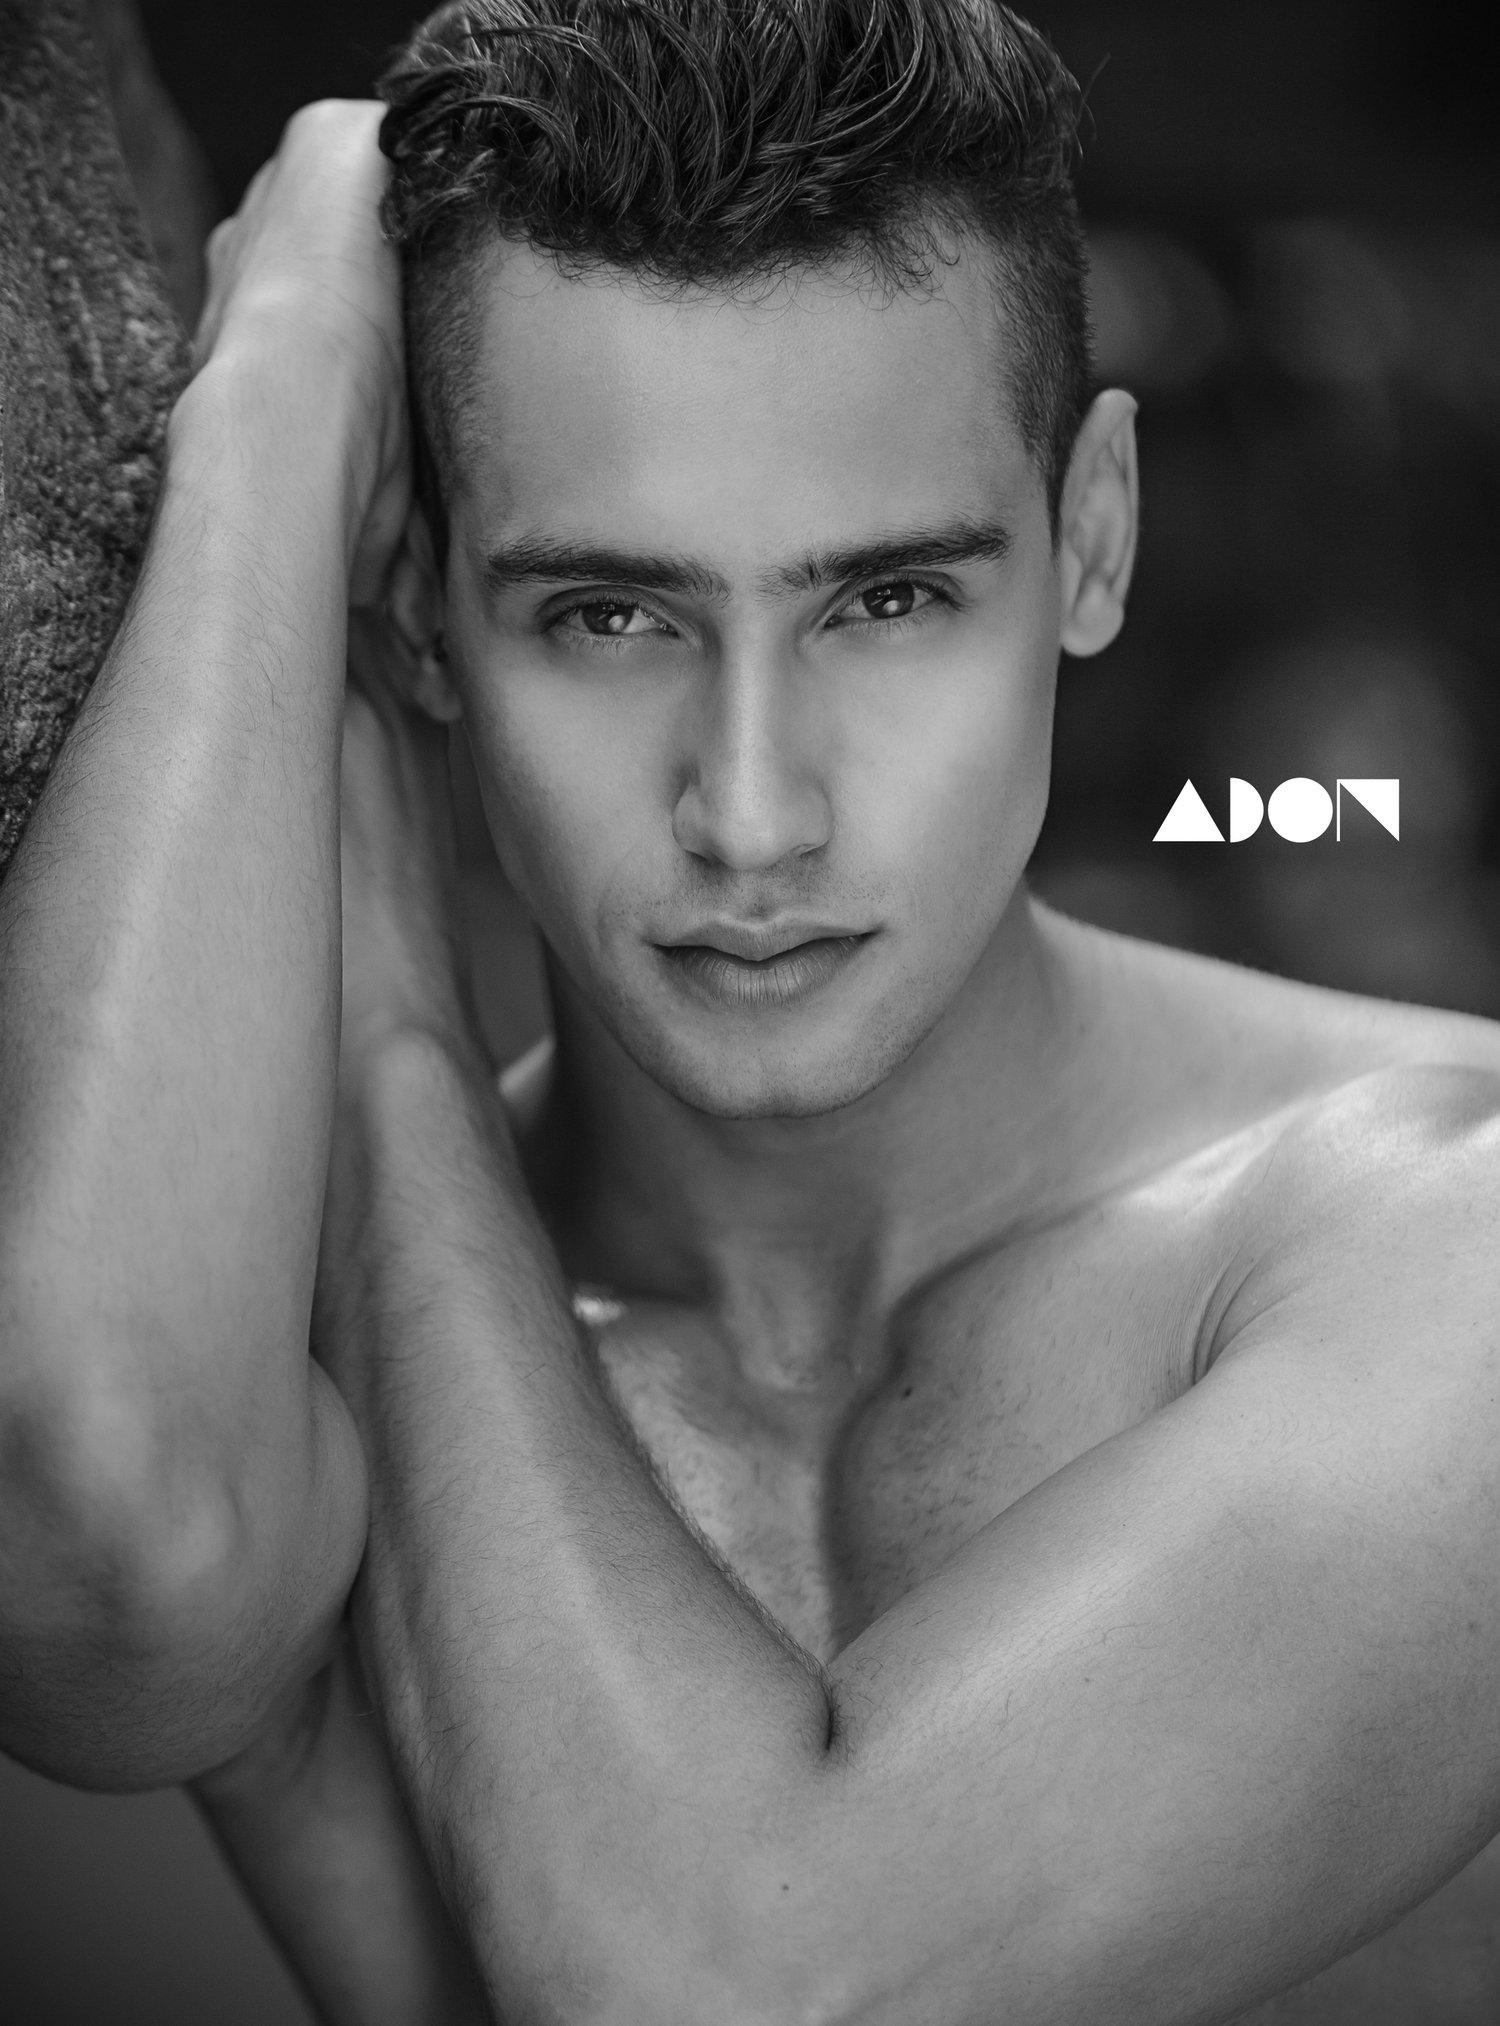 Adon Exclusive: Model Gustavo Dias By Jason Oung